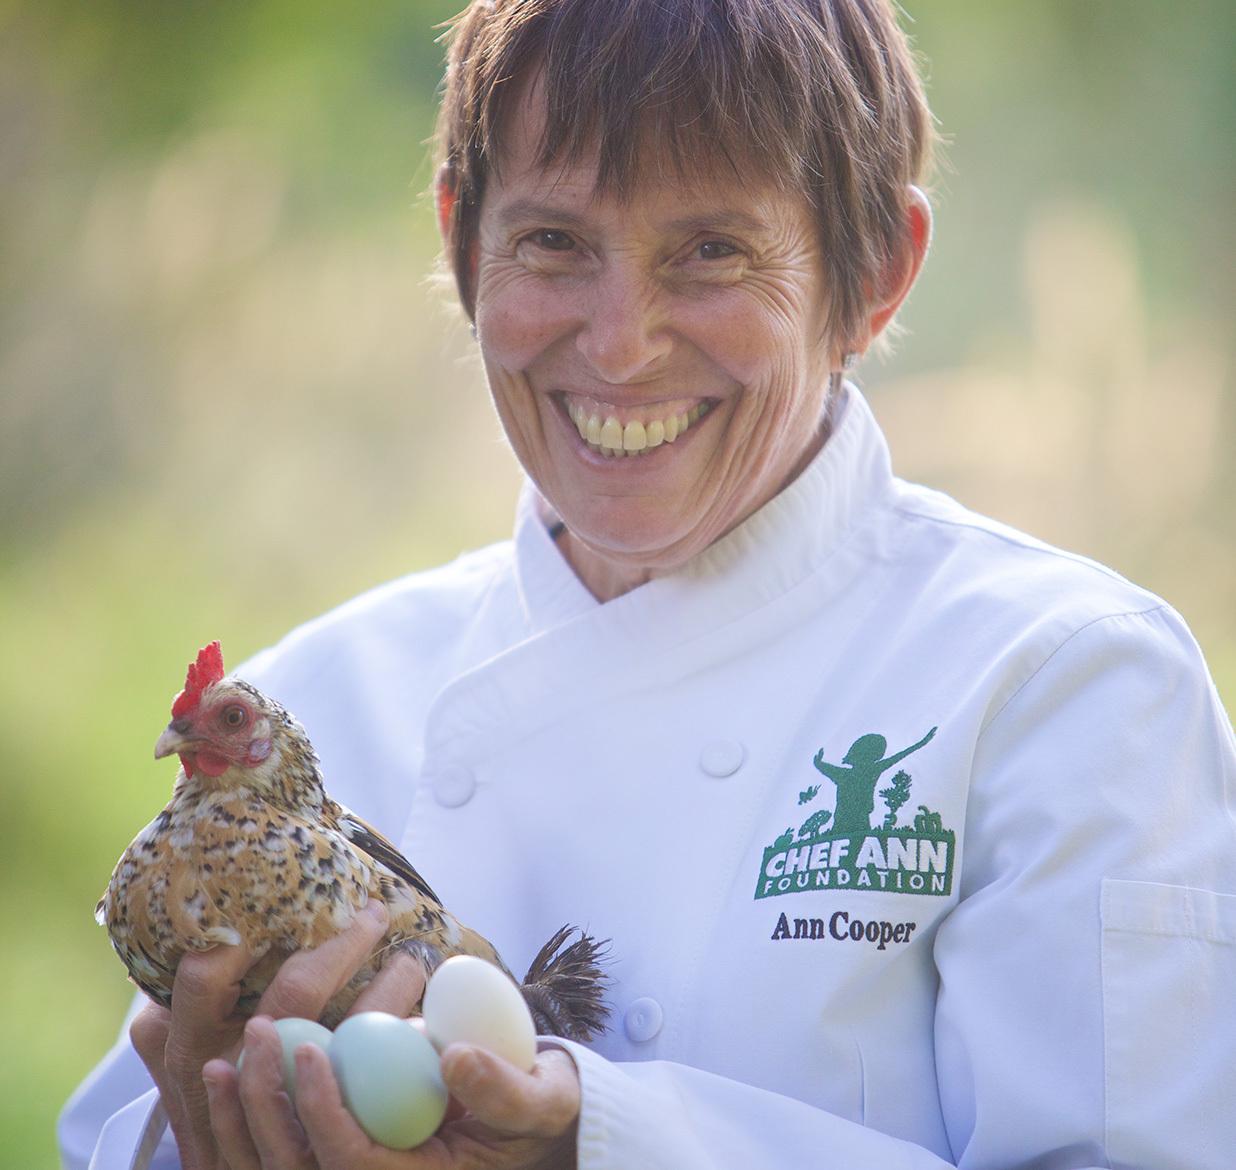 Episode 3: Chef Ann Cooper